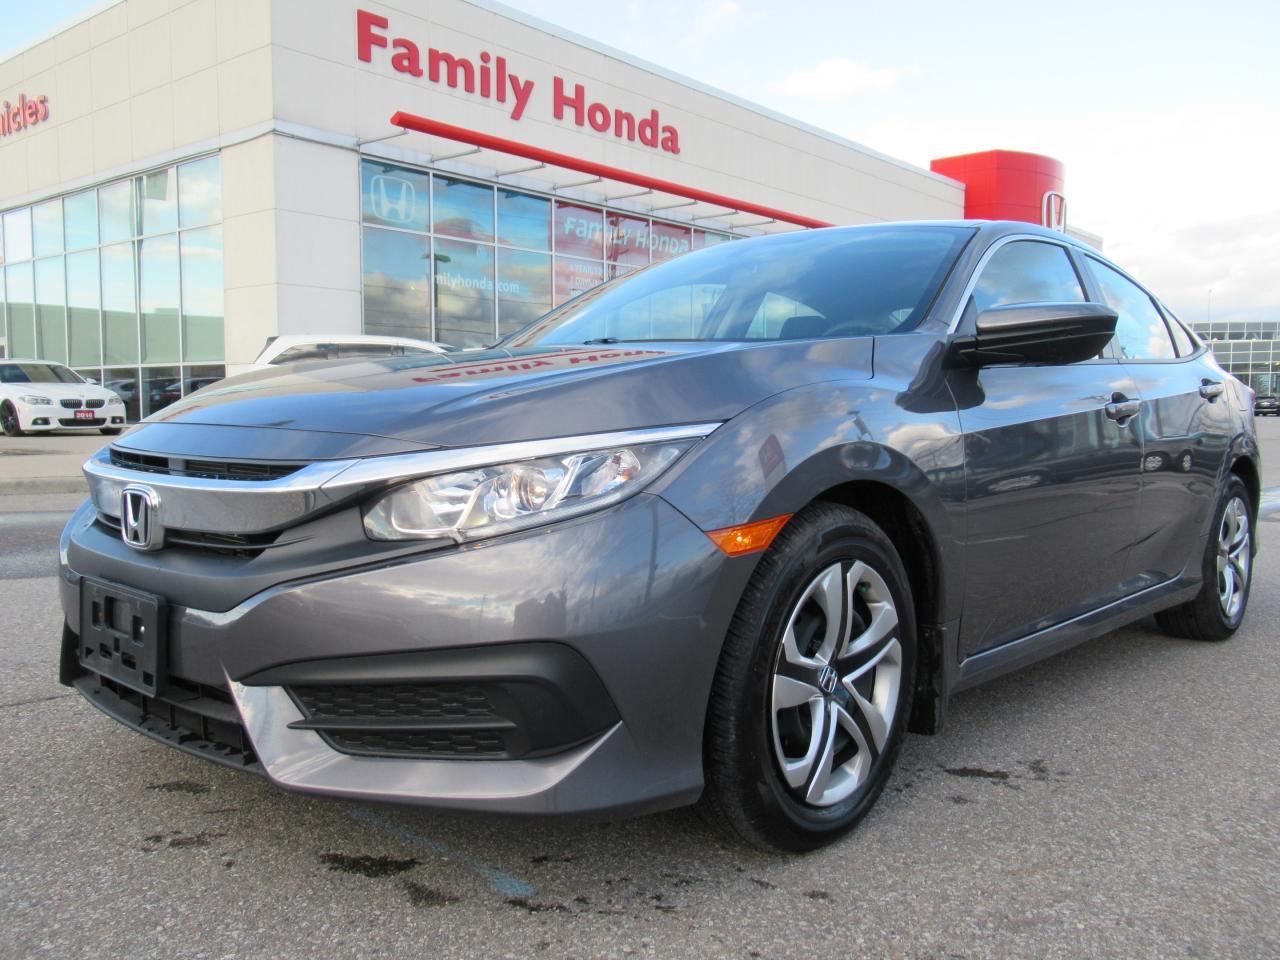 Used 2018 Honda Civic Lx Like New For Sale In Brampton Ontario